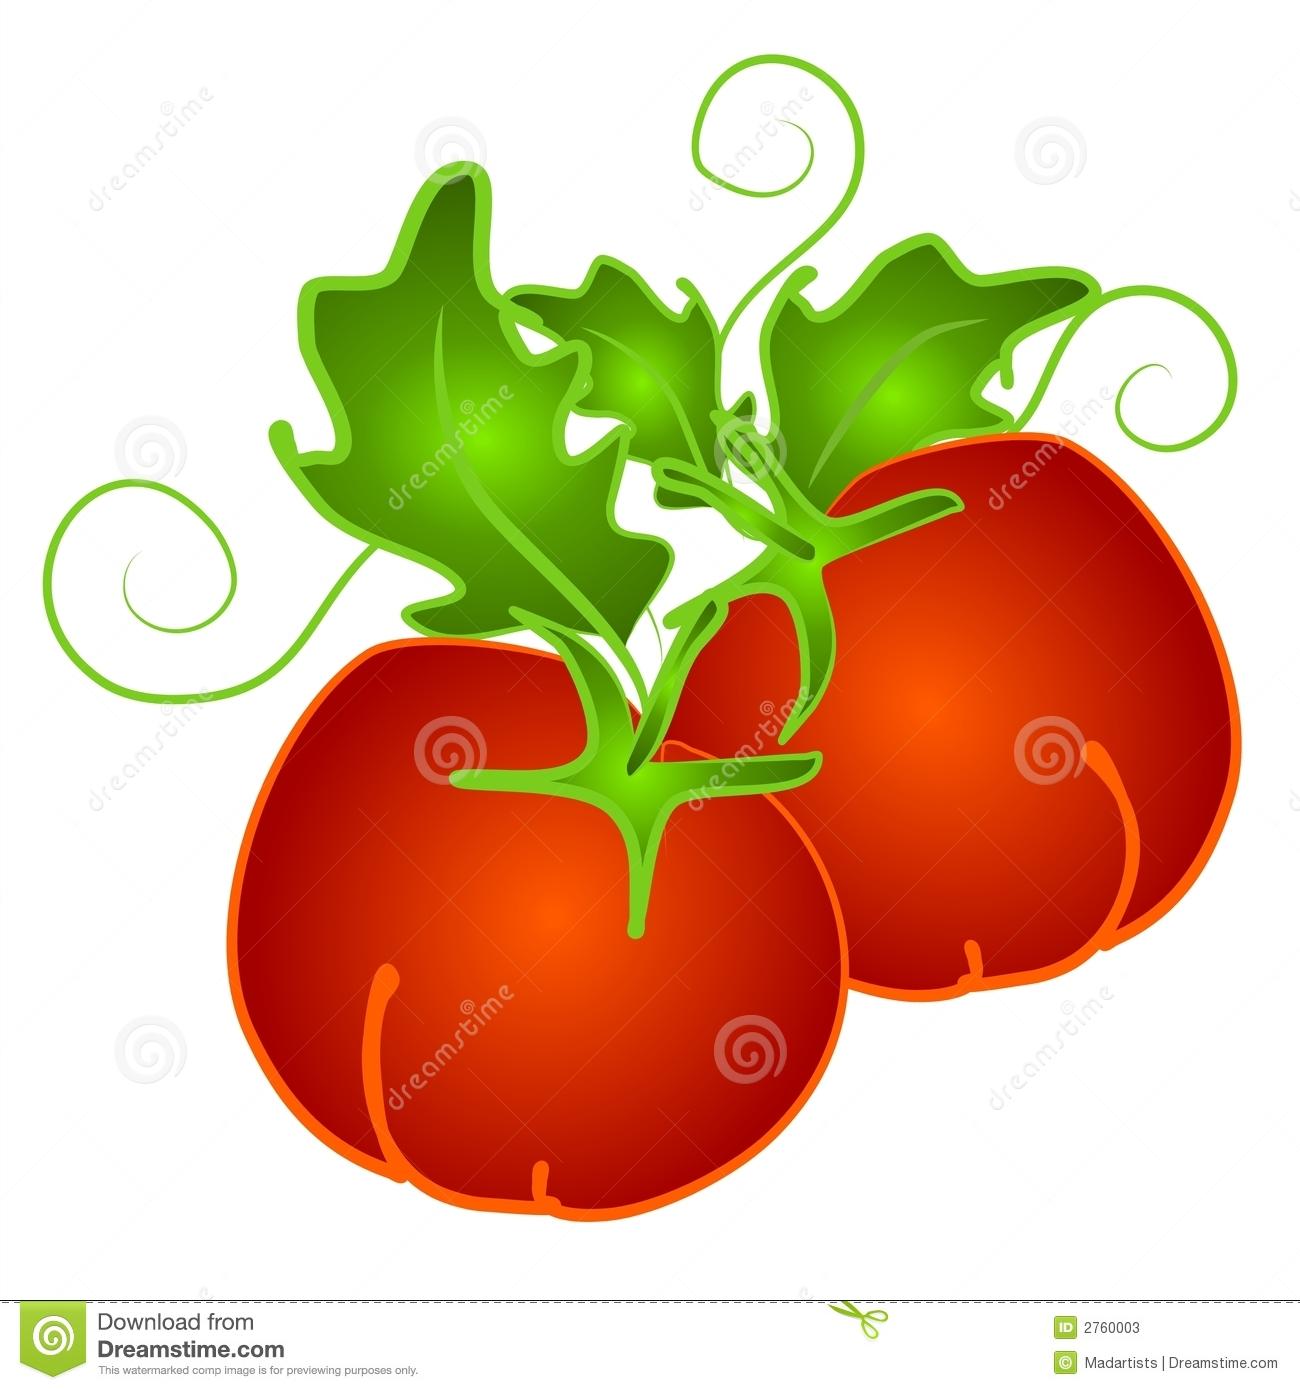 Smiling tomato kwai clipart.